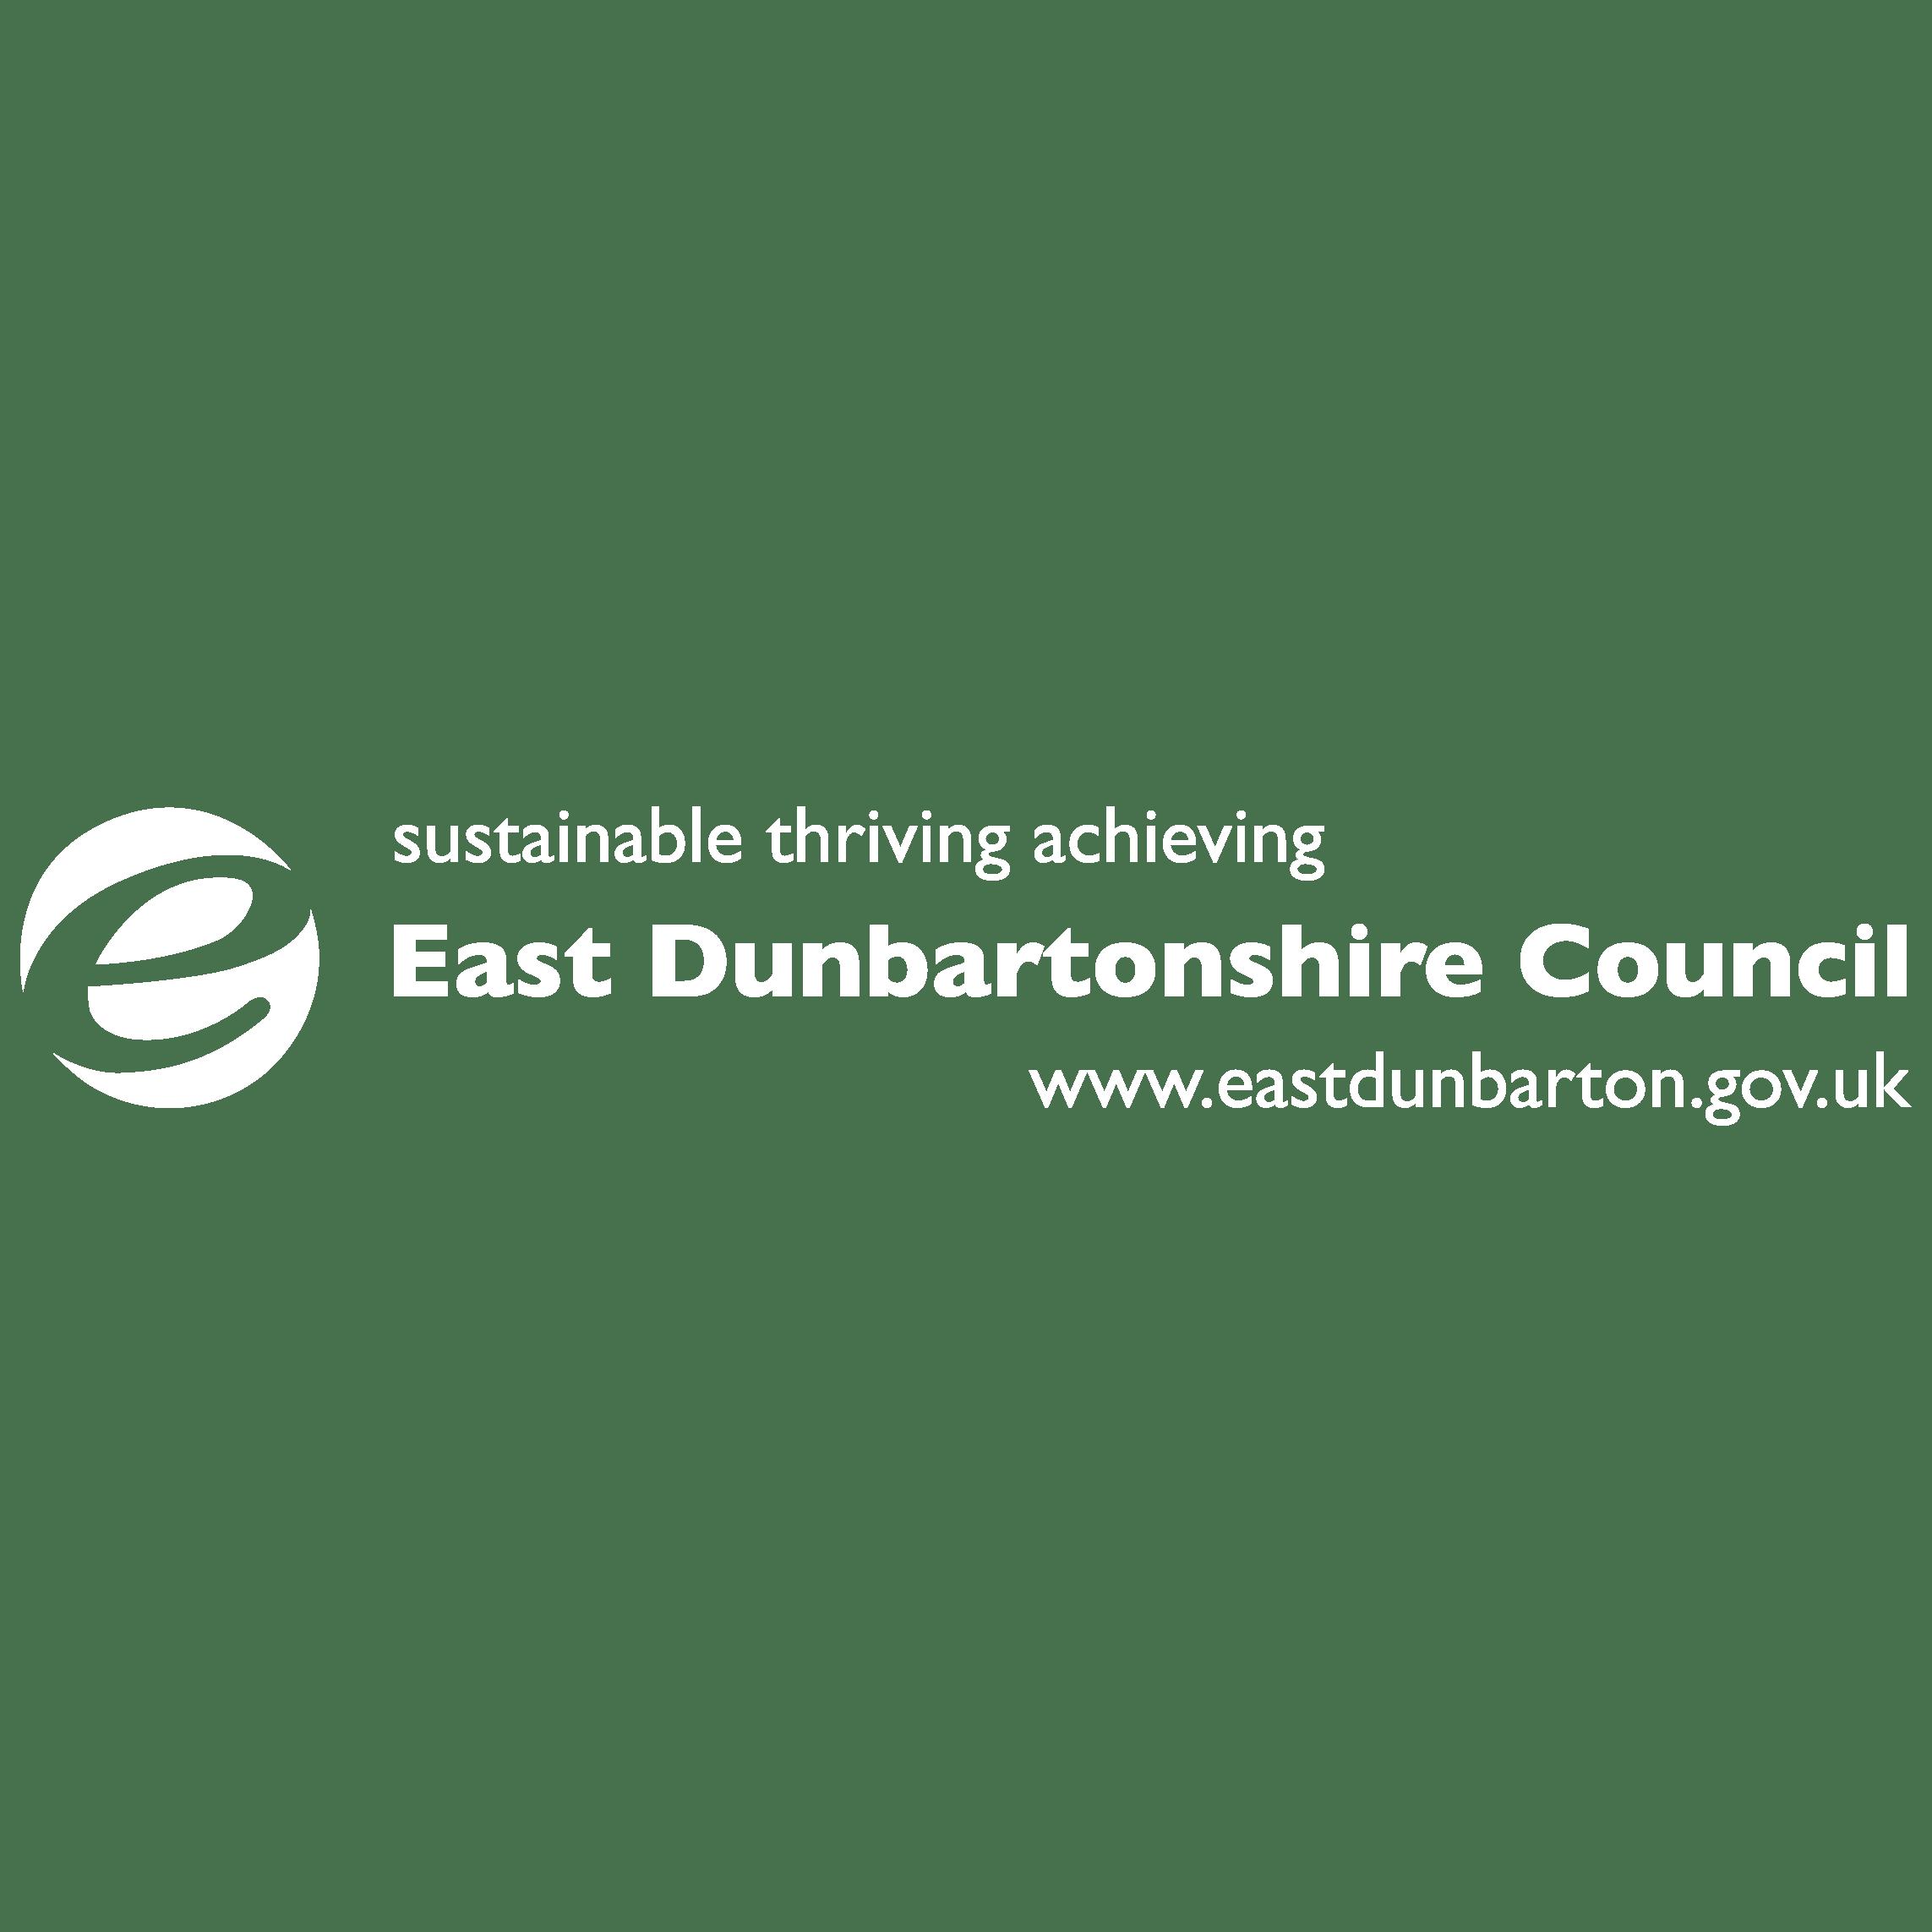 east-dunbartonshire-council-logo